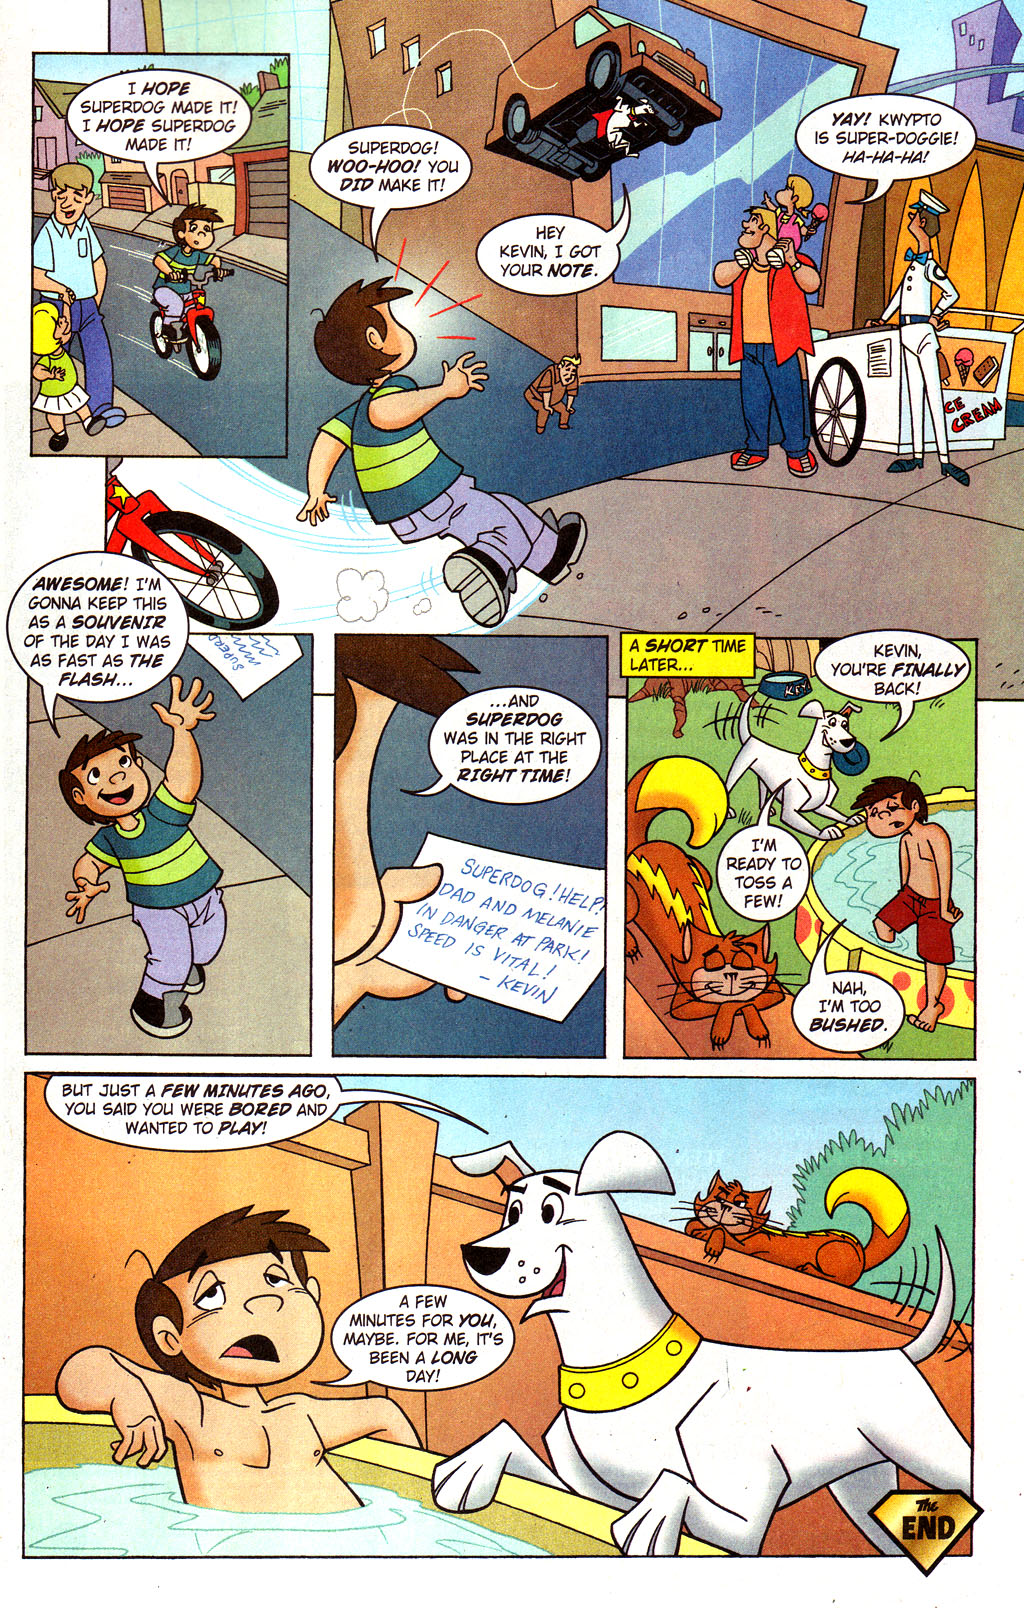 Read online Krypto the Superdog comic -  Issue #4 - 21